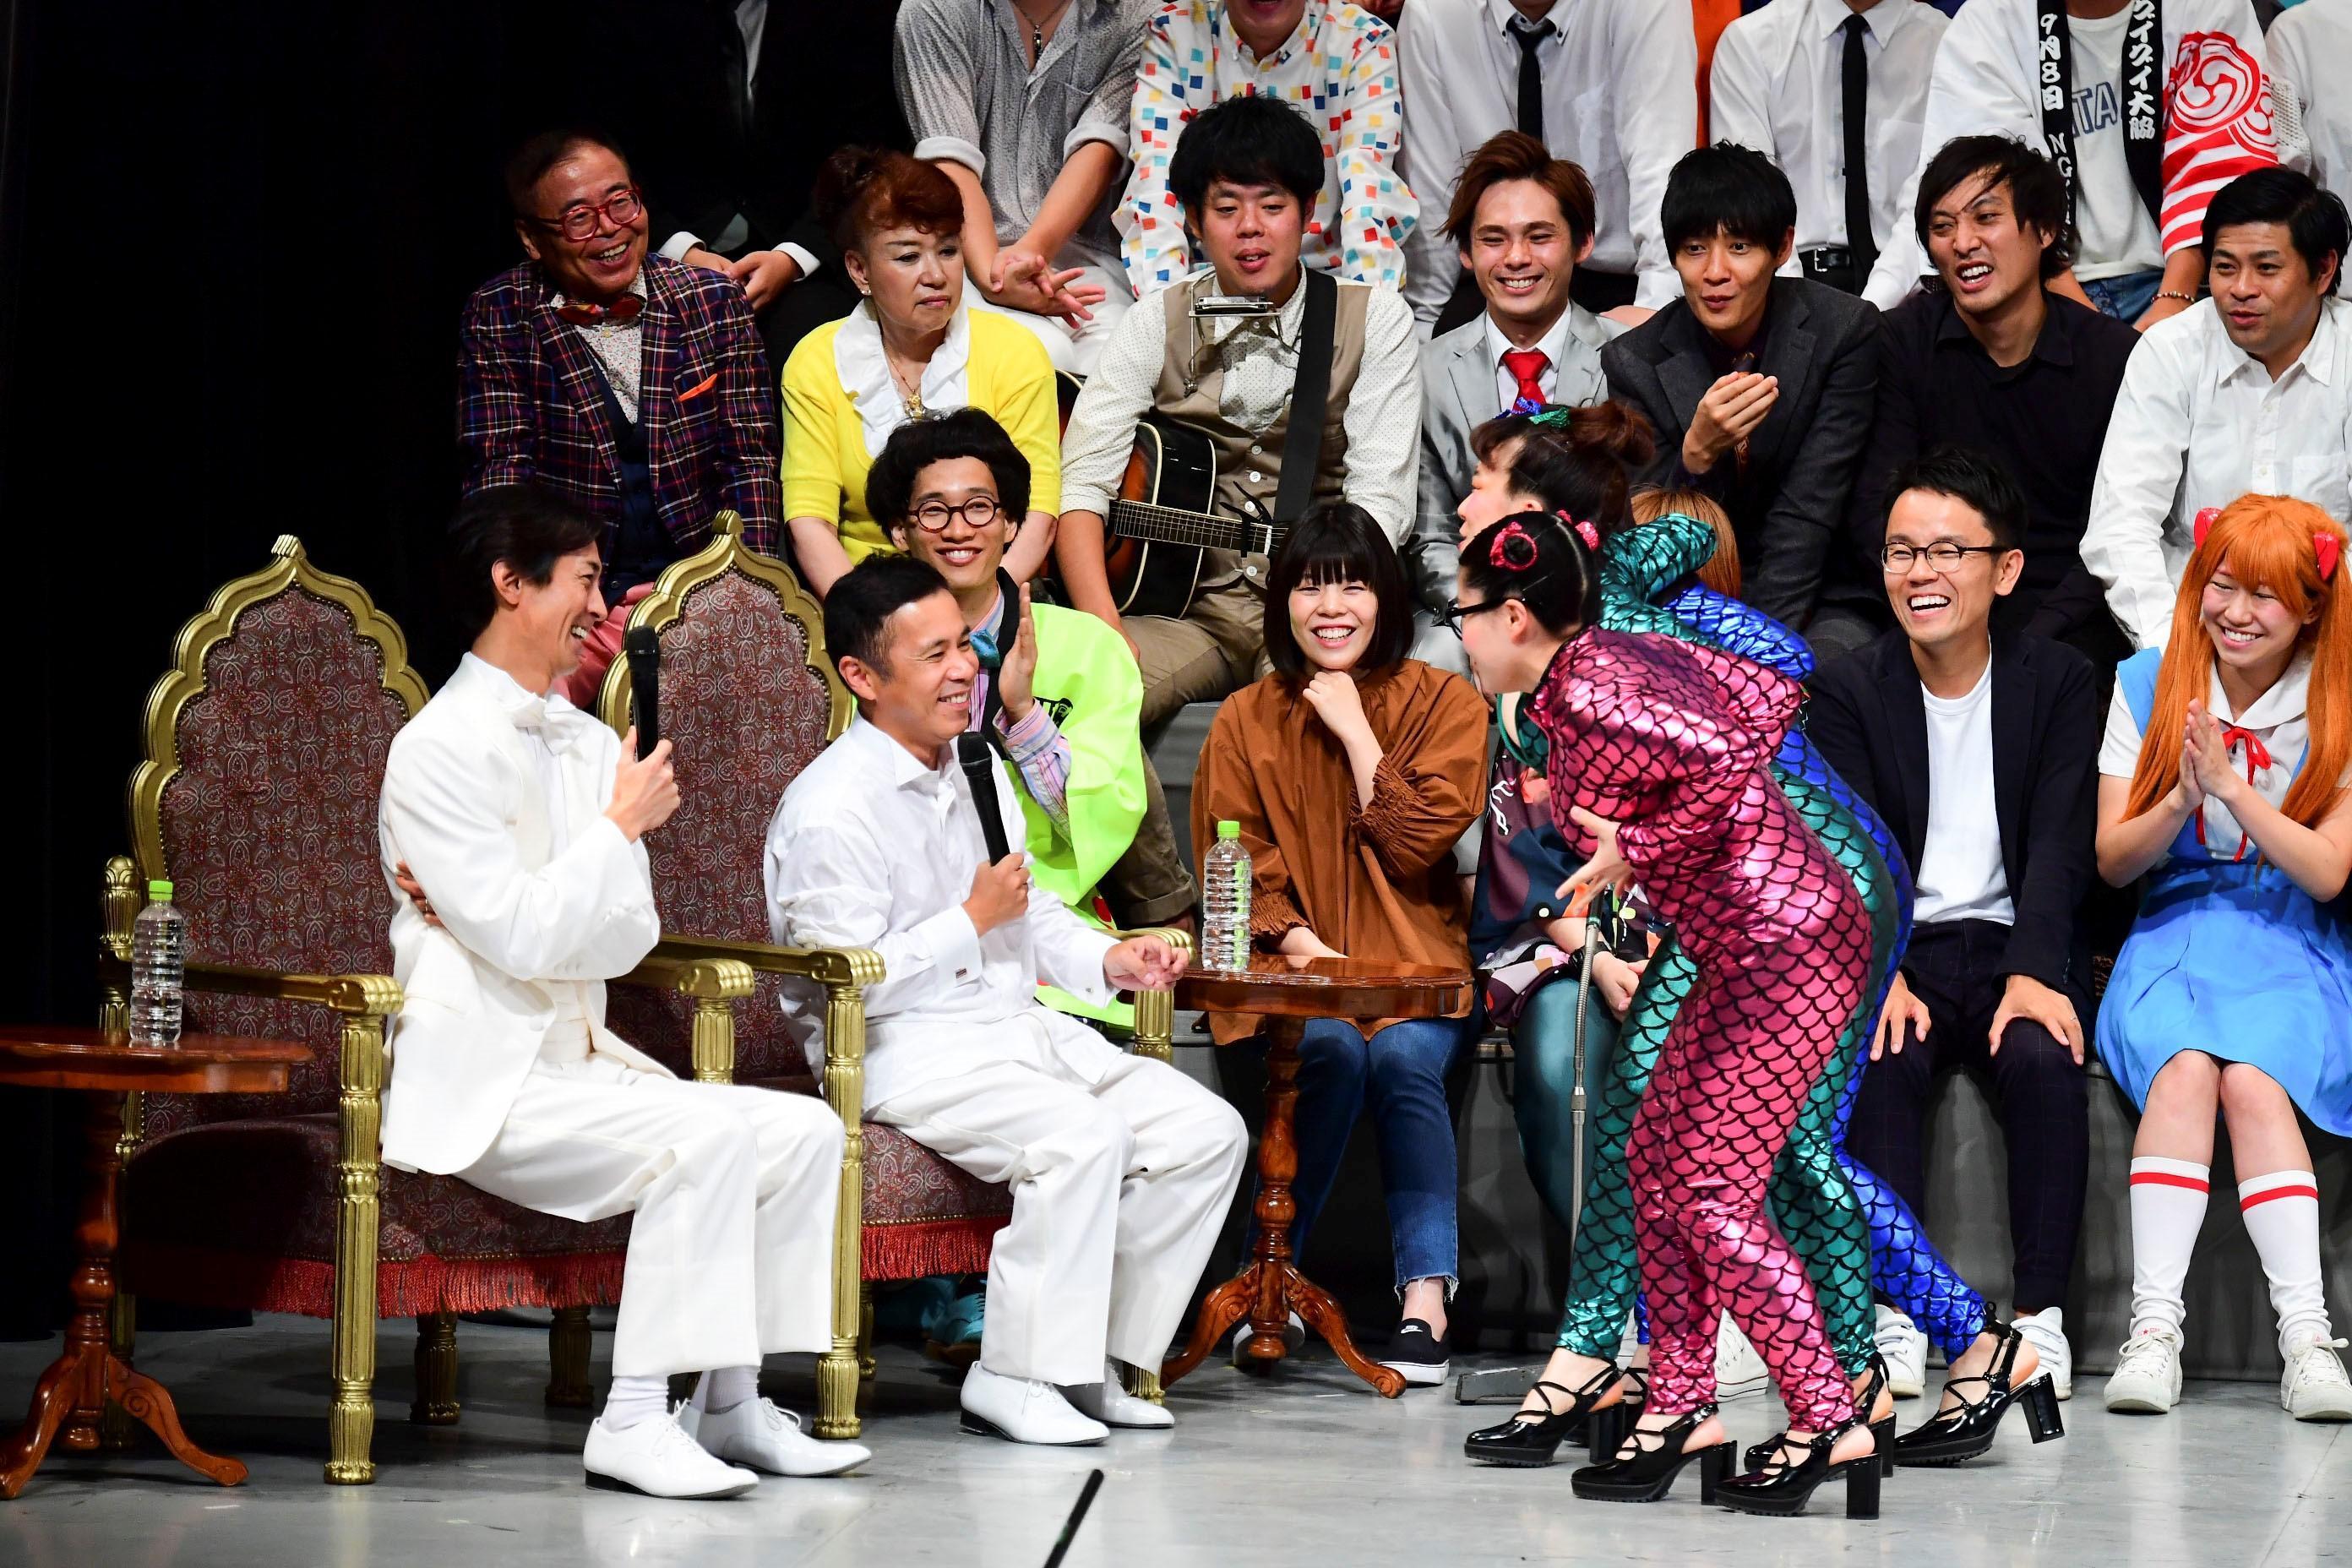 http://news.yoshimoto.co.jp/20170929193216-168be5745d17b3c61c146a6cbd0d62ff47b3ca26.jpg